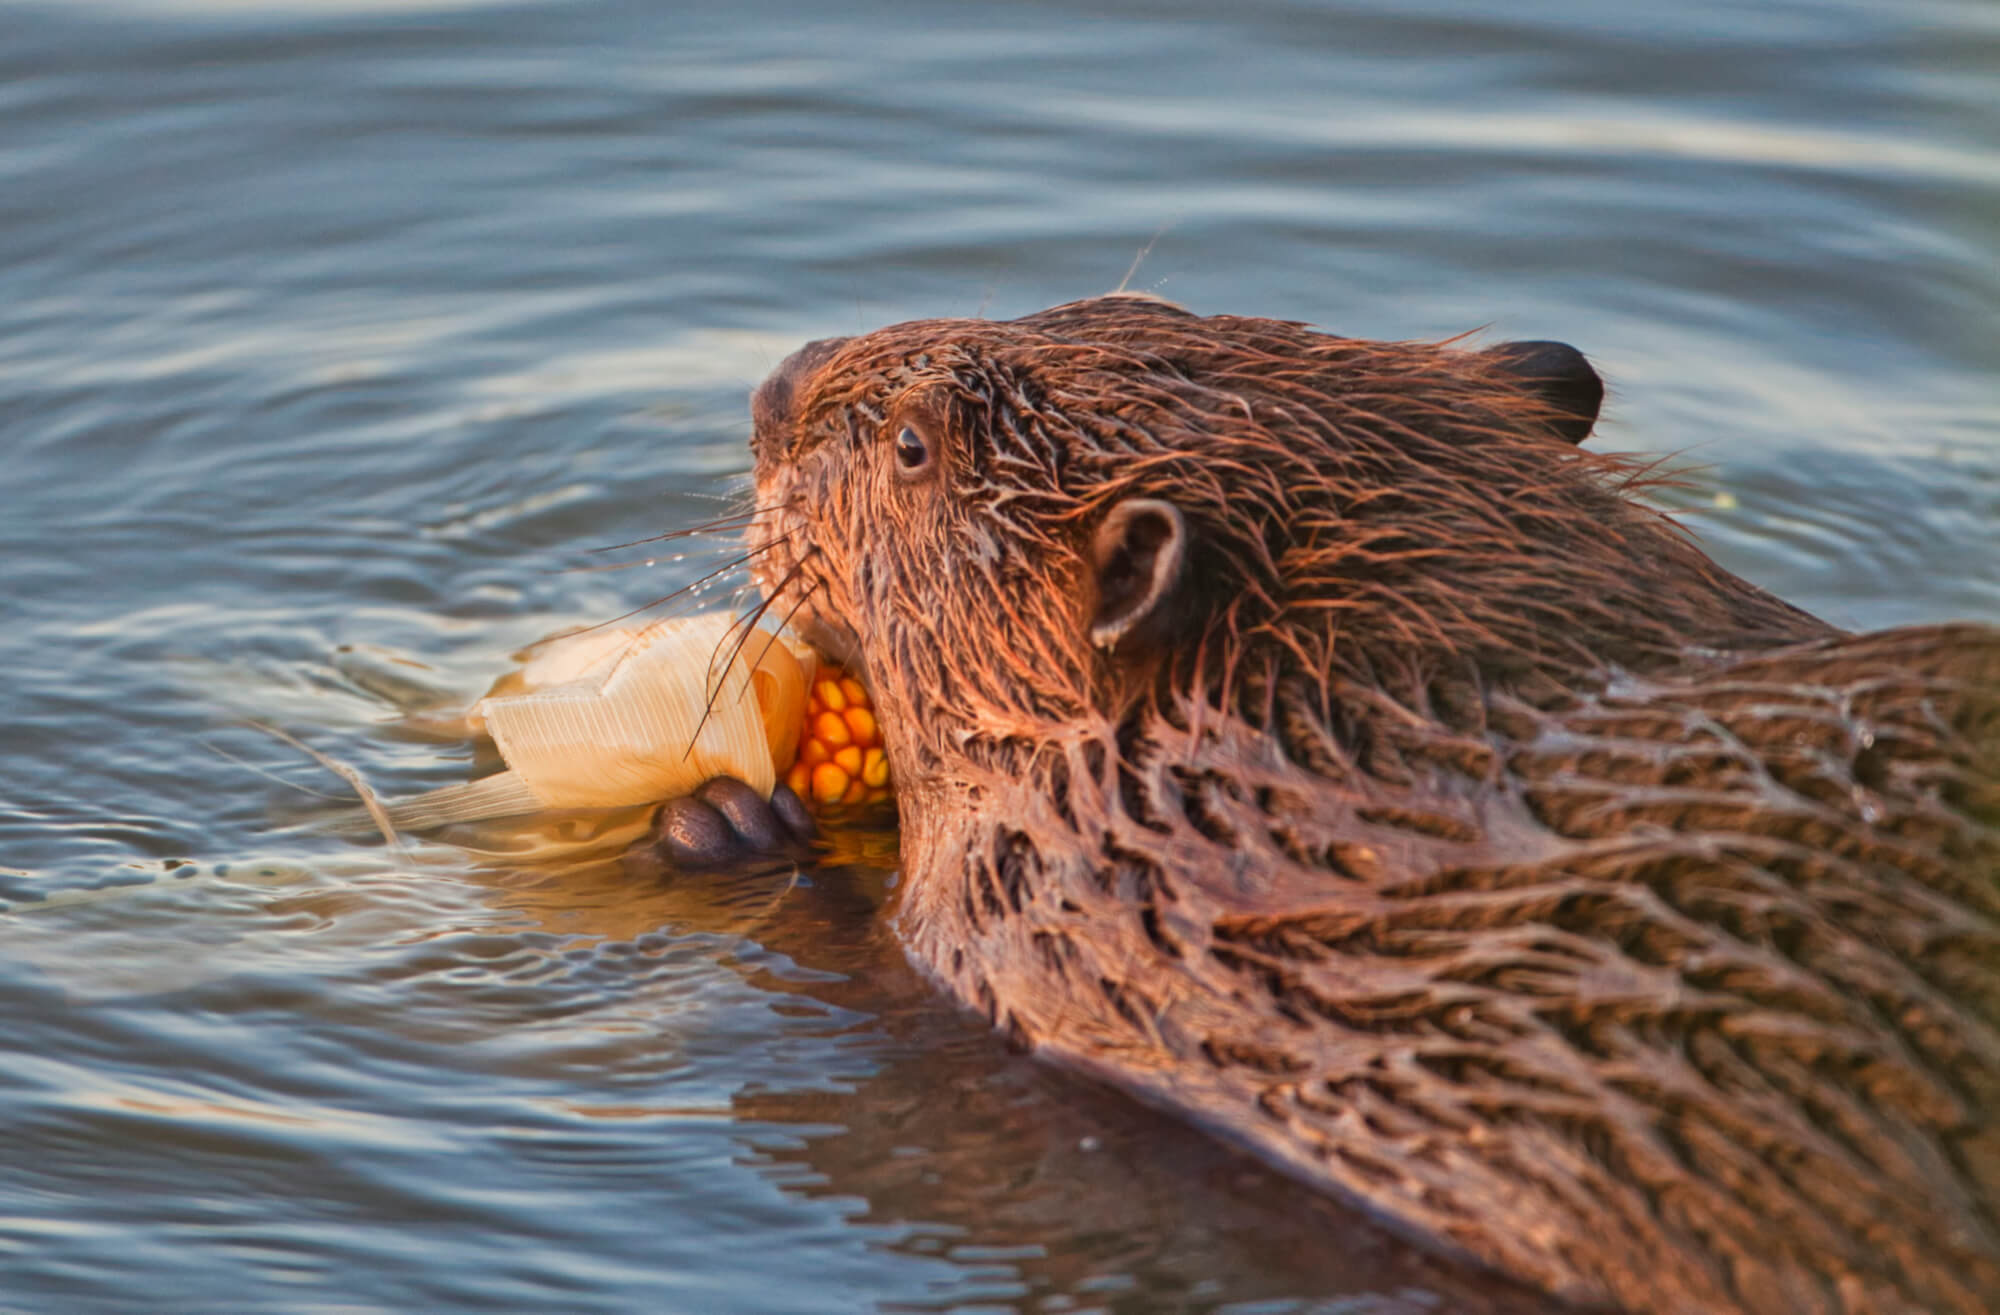 Beaver Eating Corn On The Cob